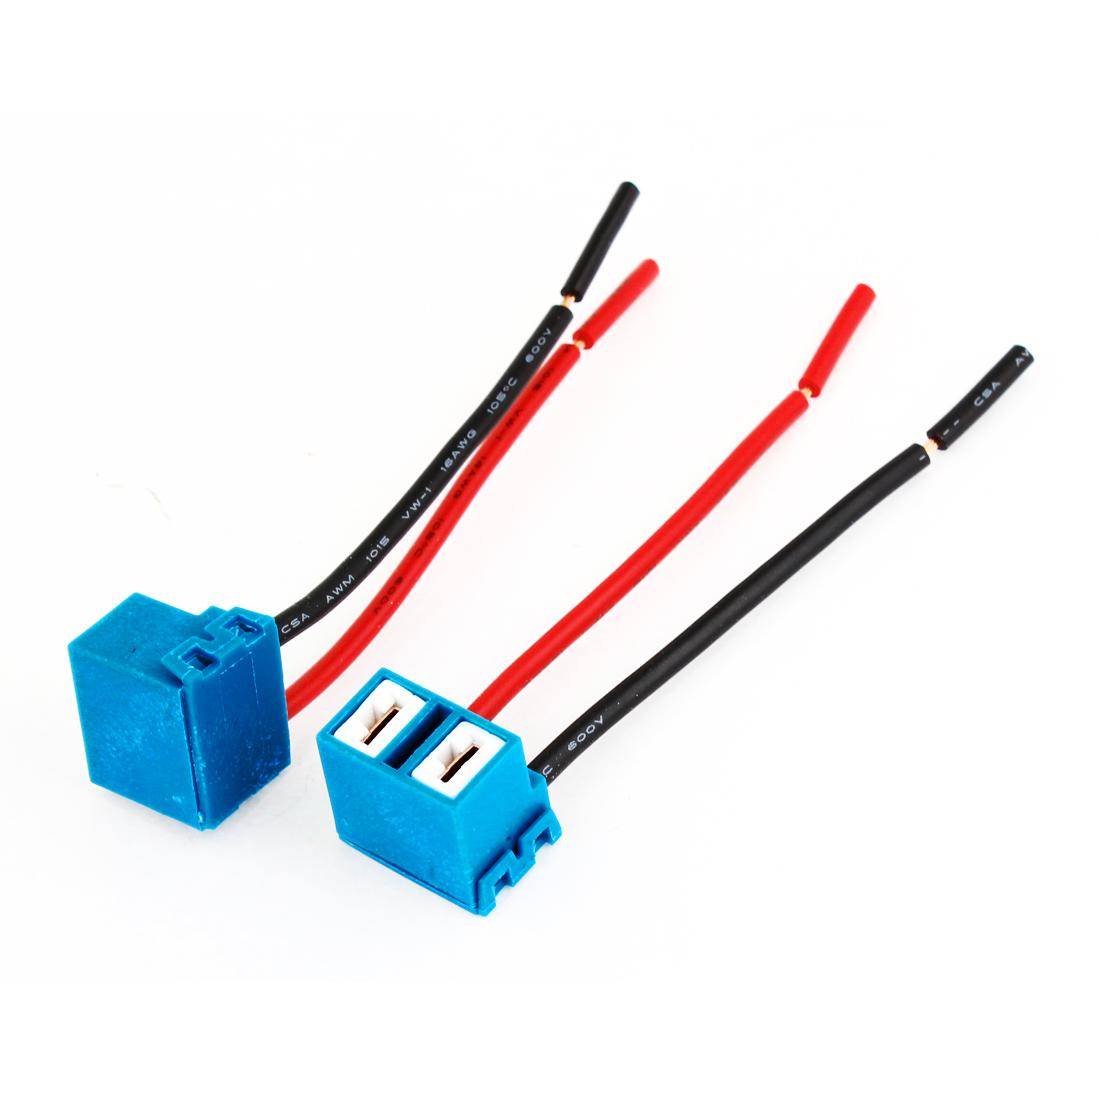 2 x H7 Ceramic Headlight Light Bulb Wire Connector Plug Socket for Car